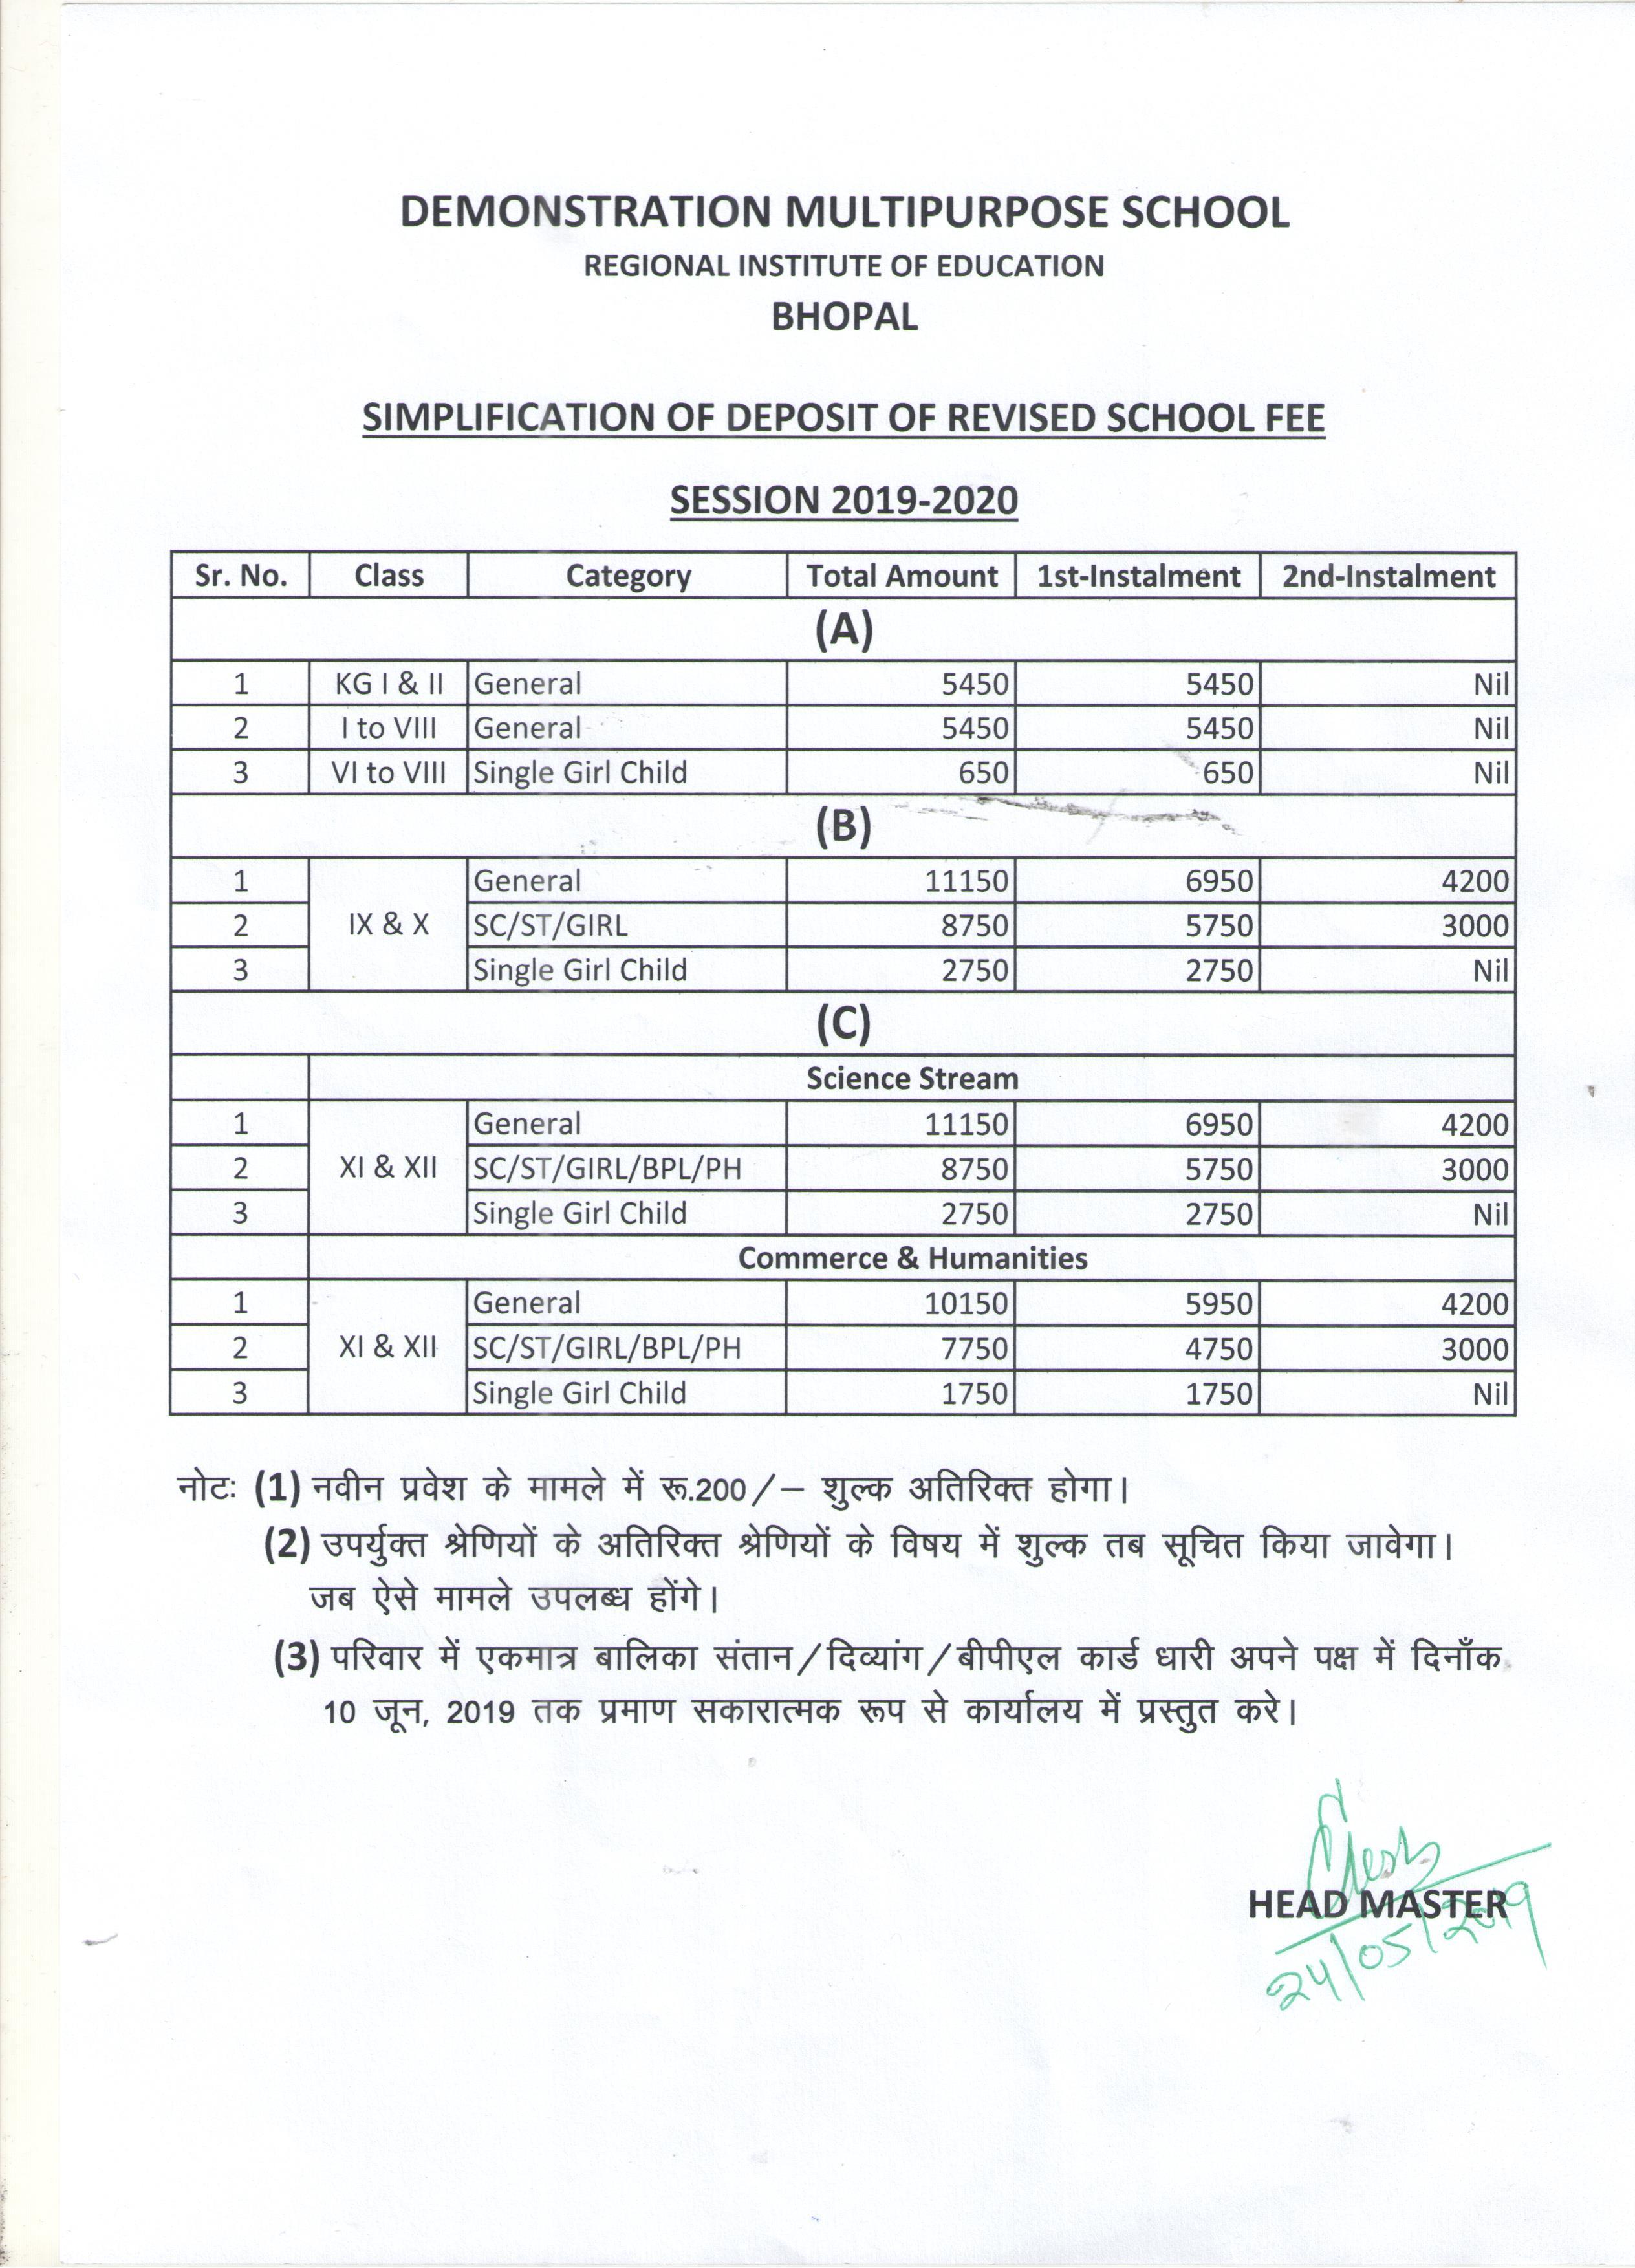 Demonstration Multipurpose School Bhopal ::